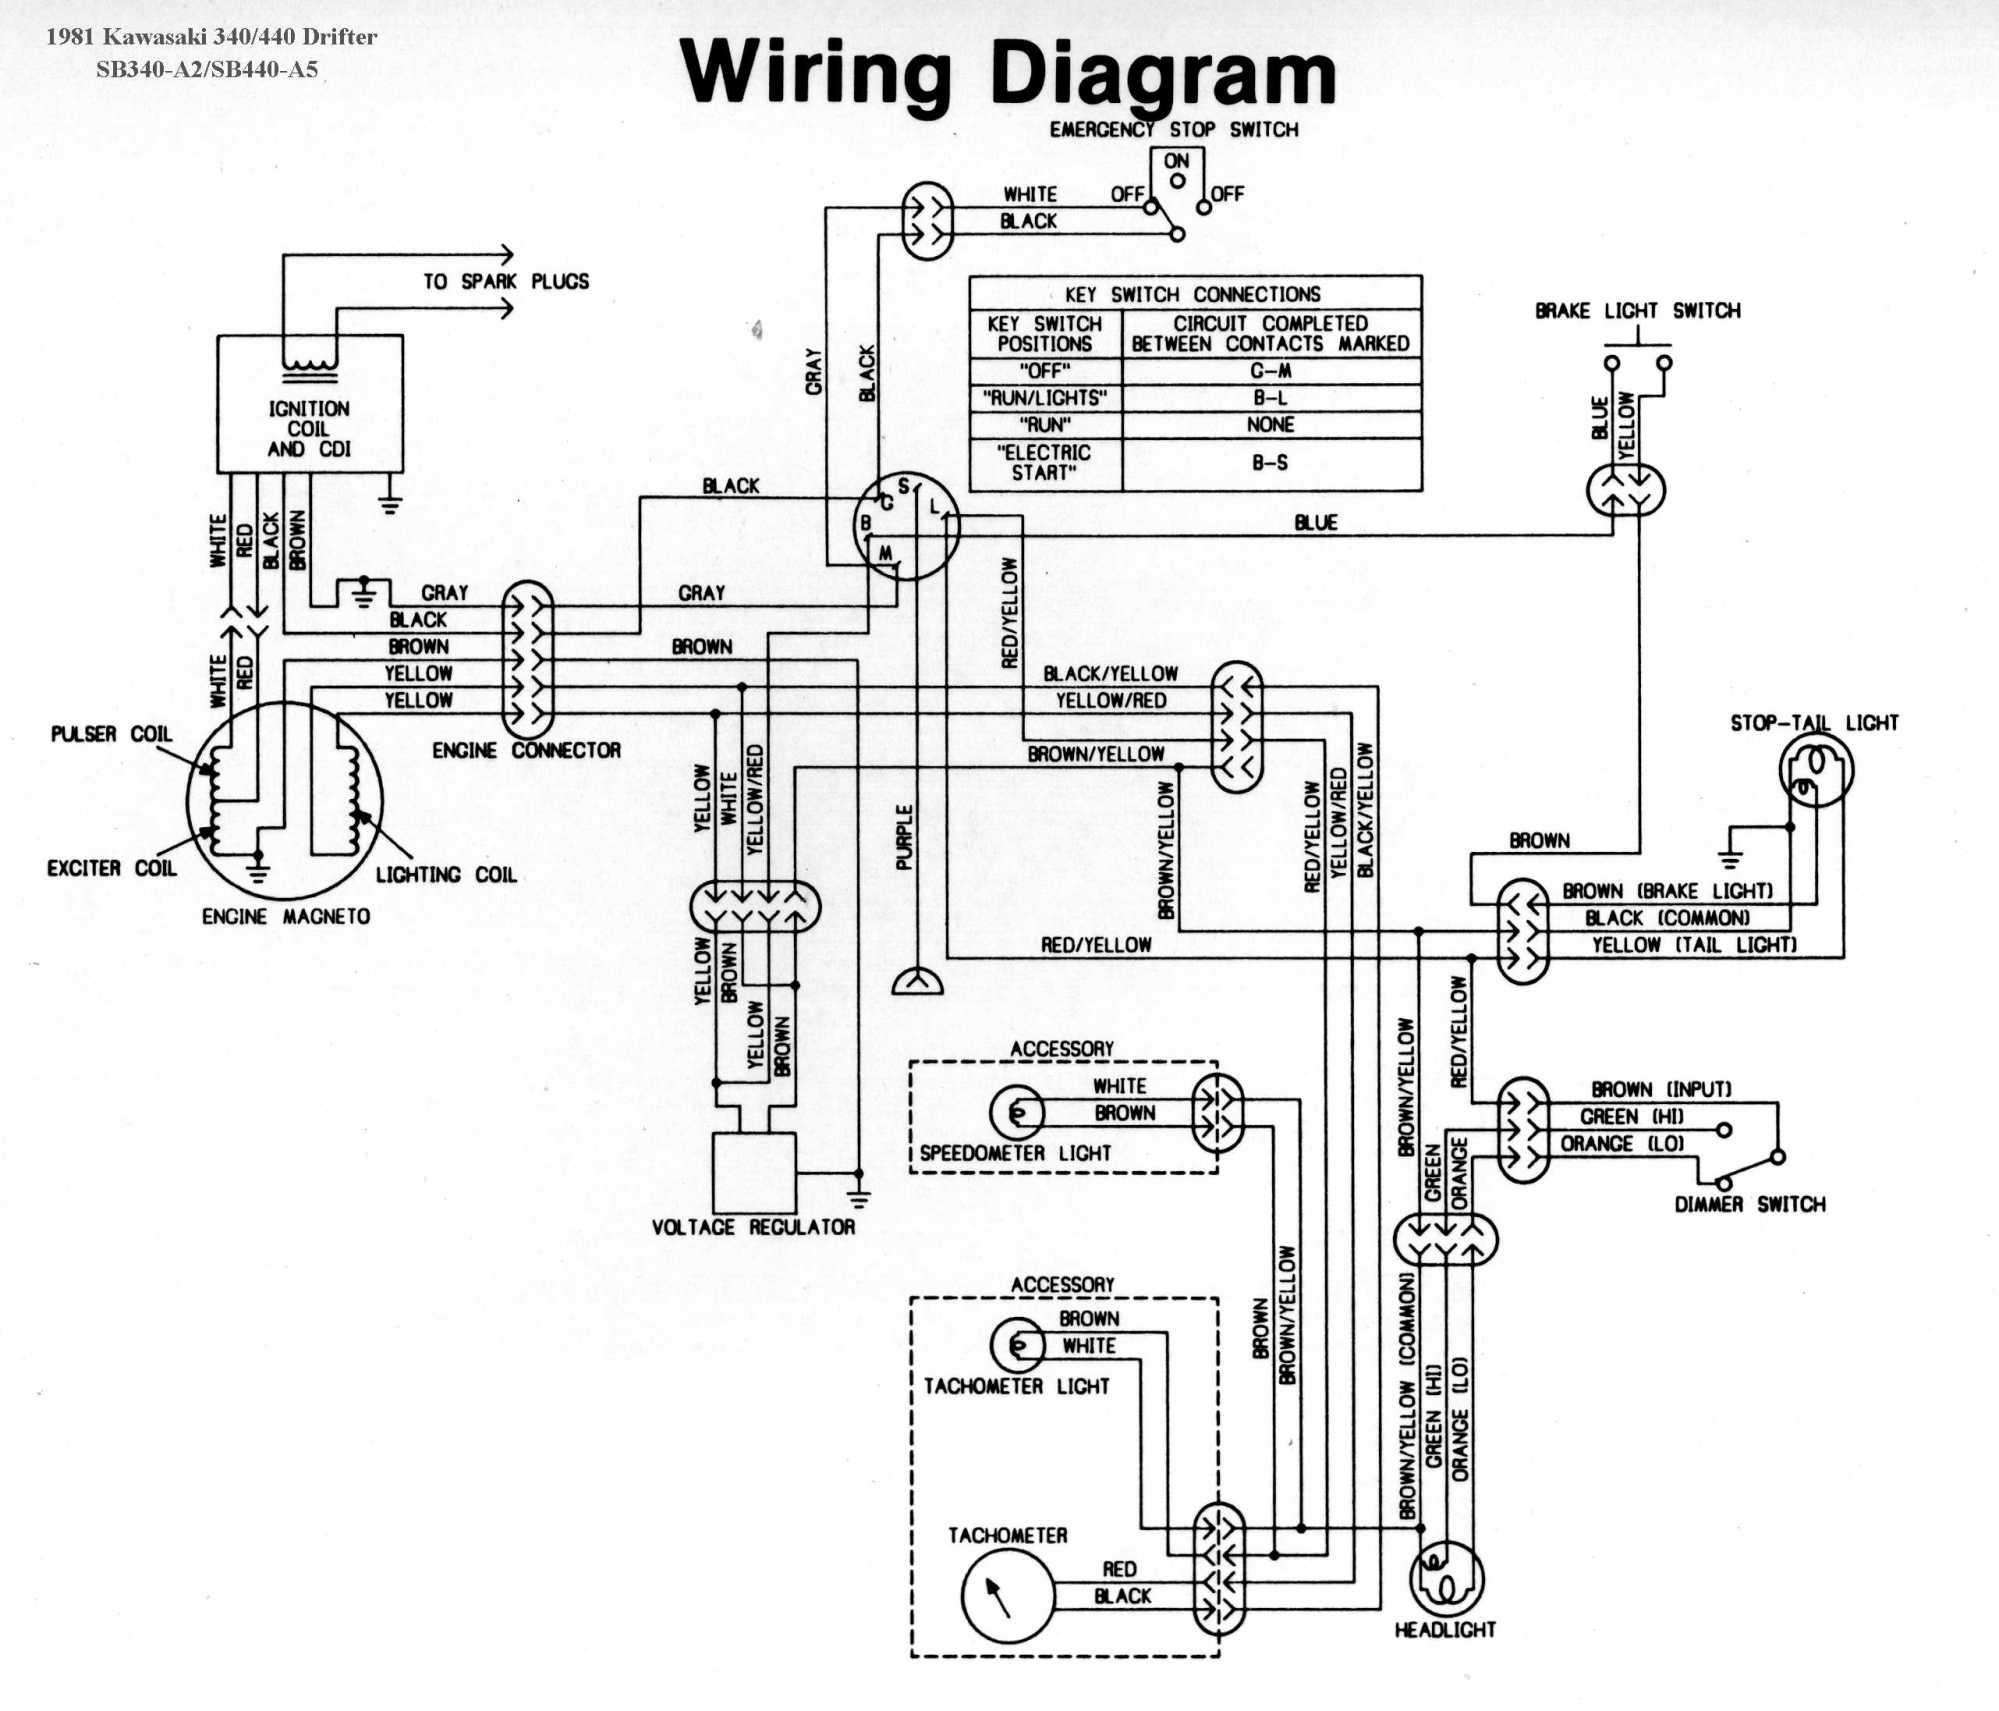 hight resolution of 1980 kawasaki ke100 wiring diagram